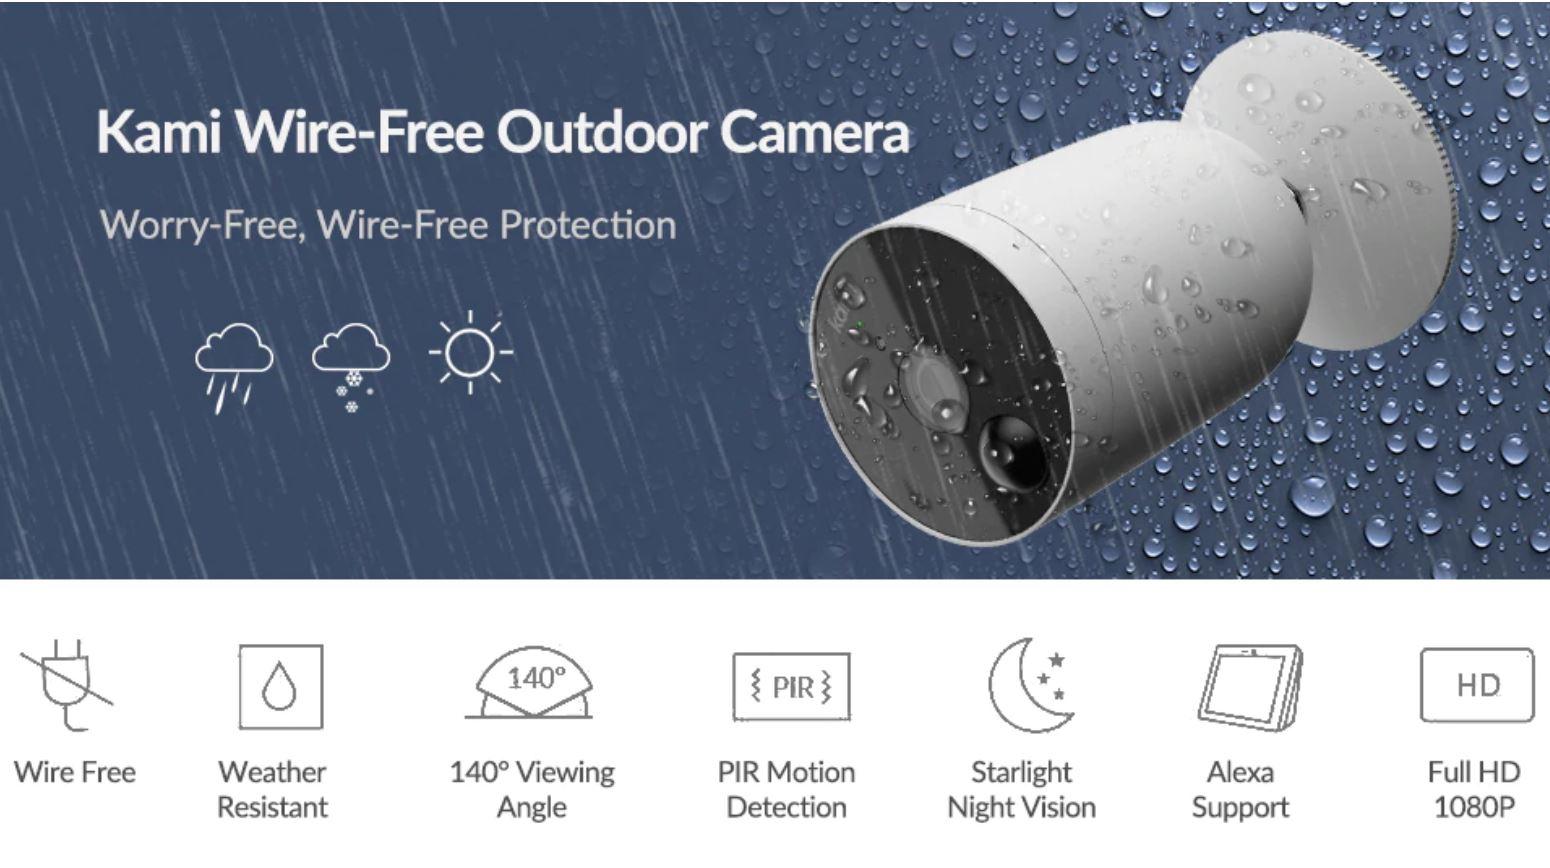 YI Kami Wire-free Outdoor Camera